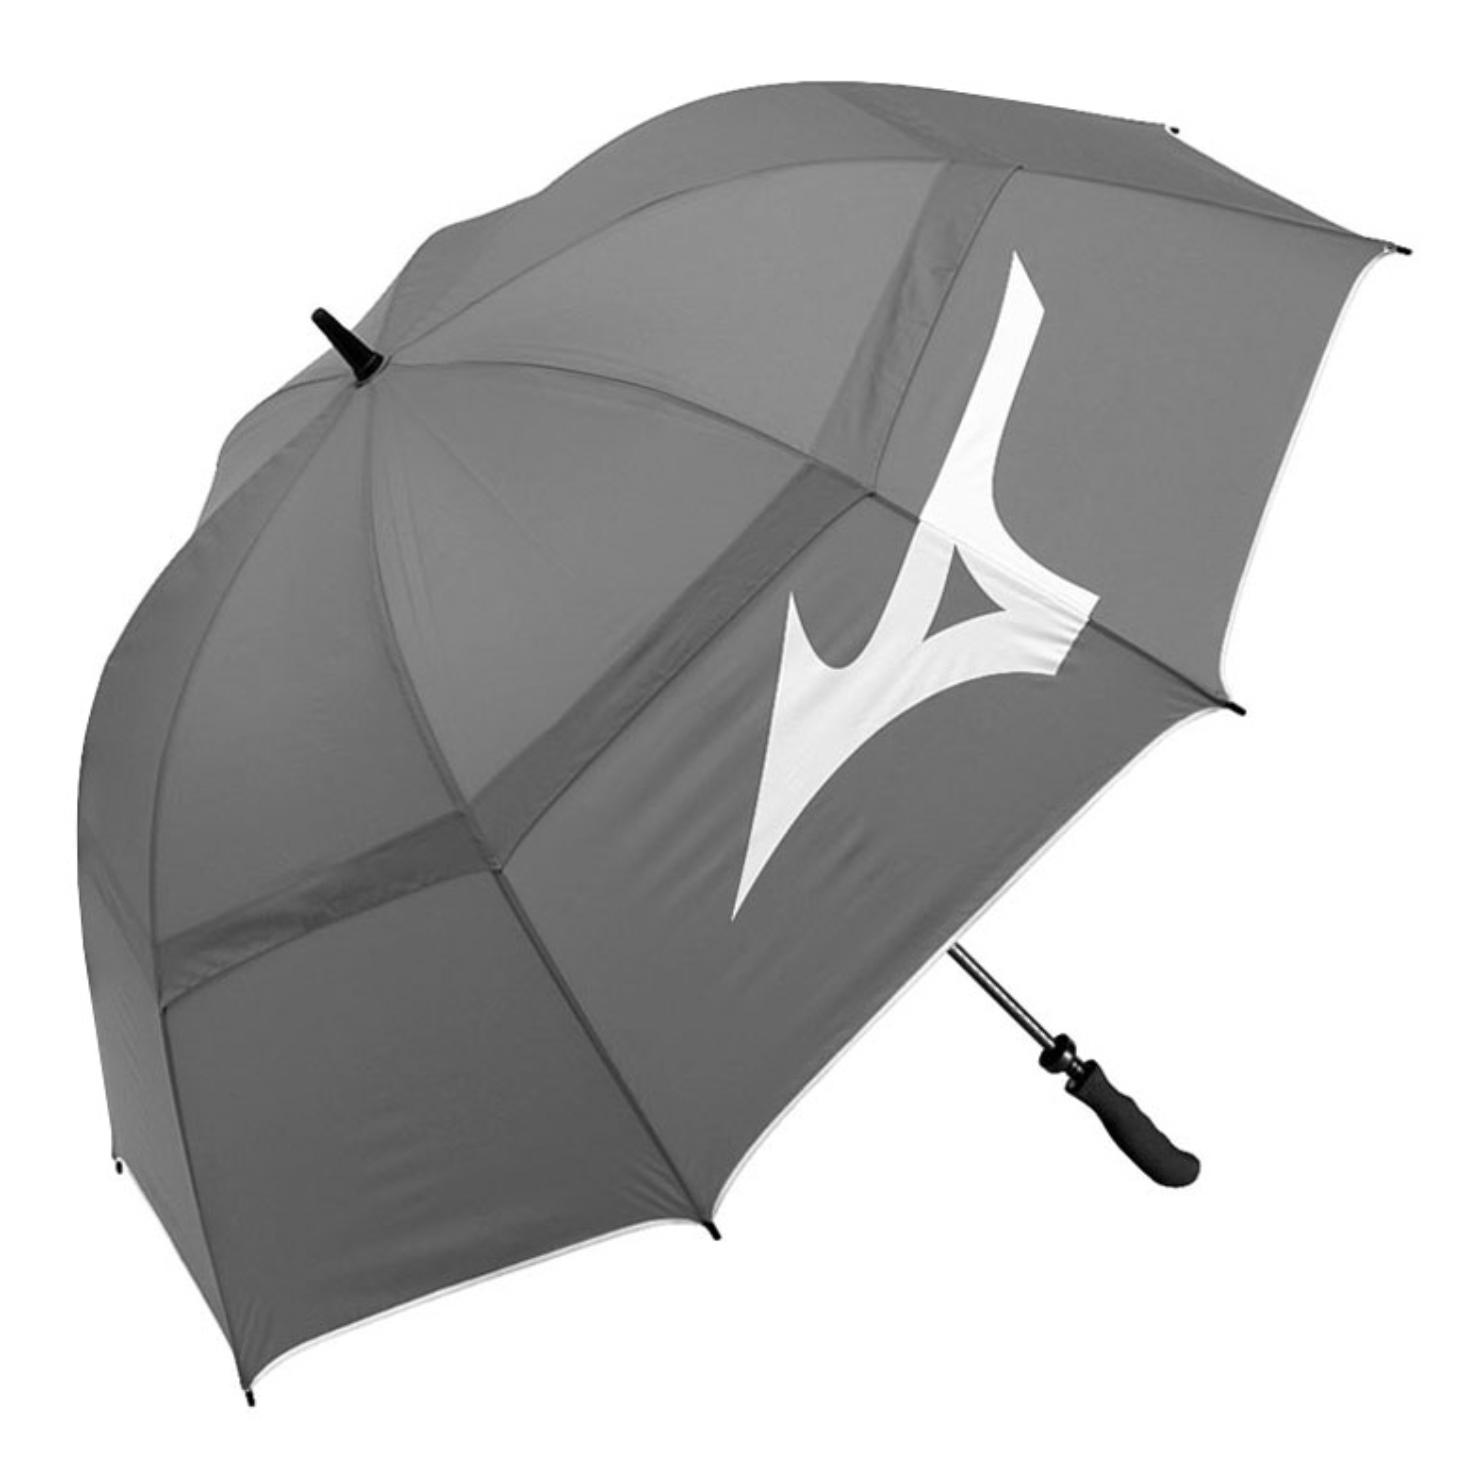 Mizuno Mizuno Tour Twin Canopy Golf Paraplu, Grijs